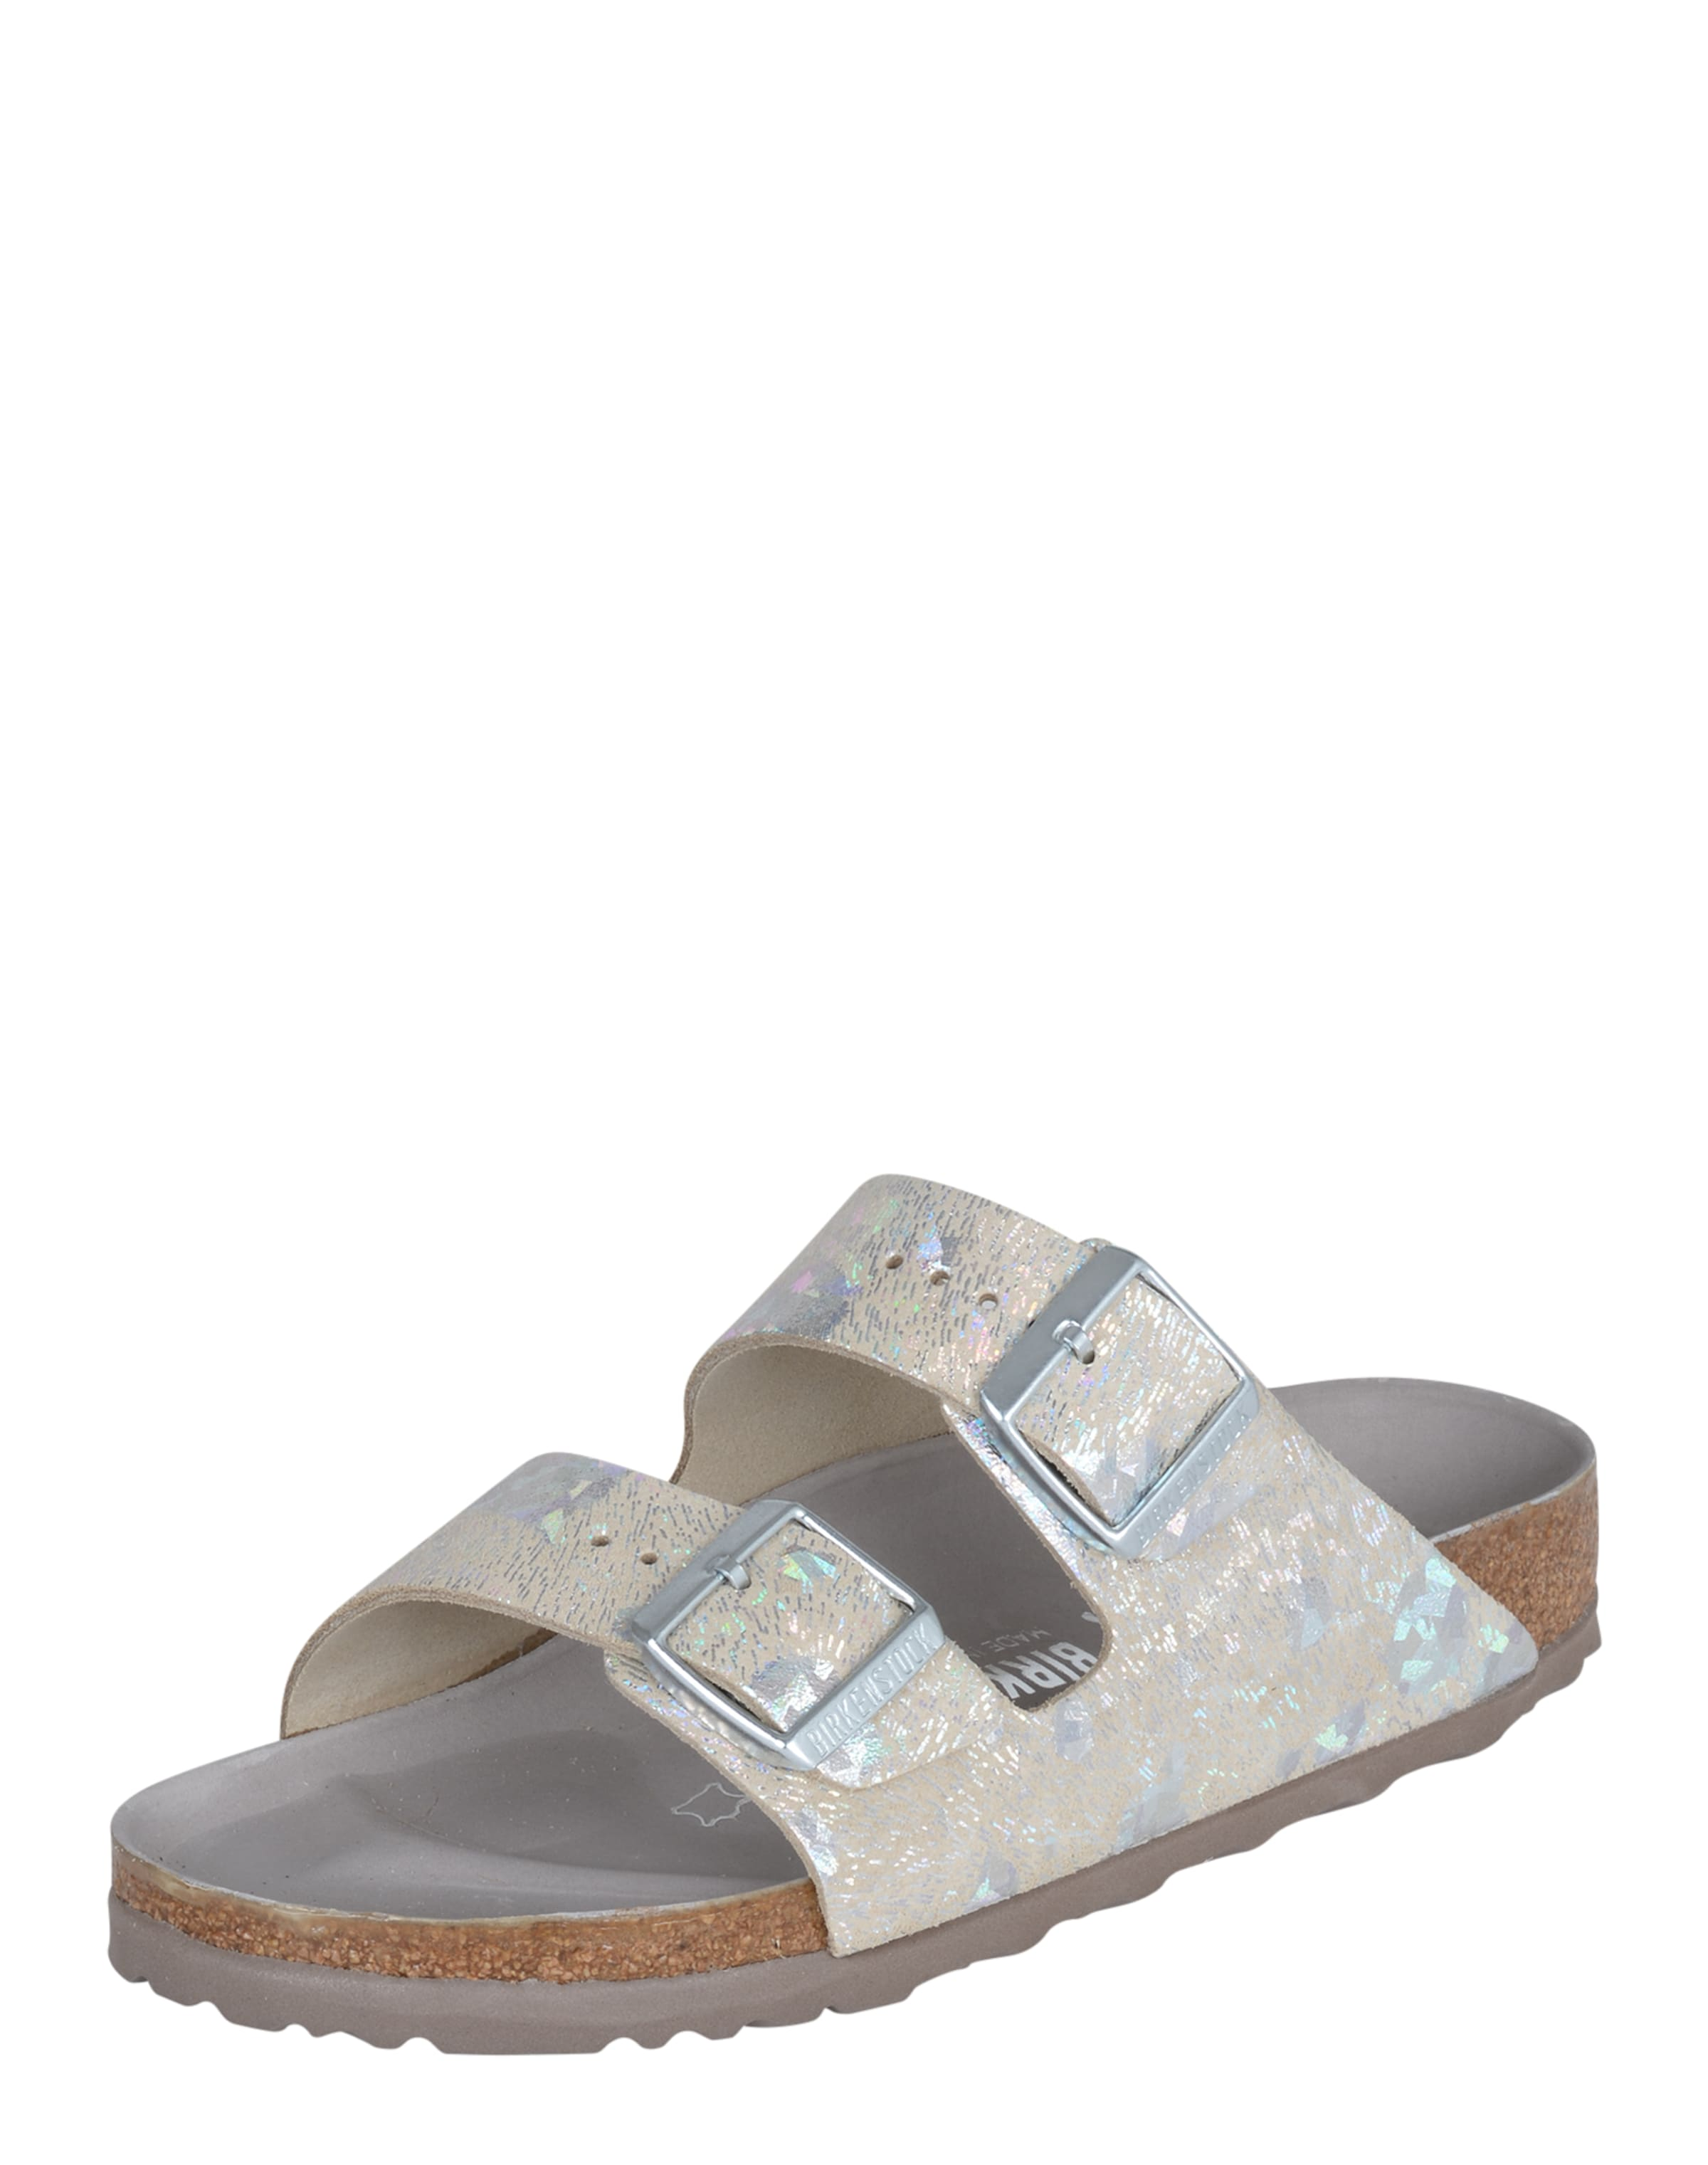 BIRKENSTOCK Sandale Arizona Hex schmal Hohe Qualität